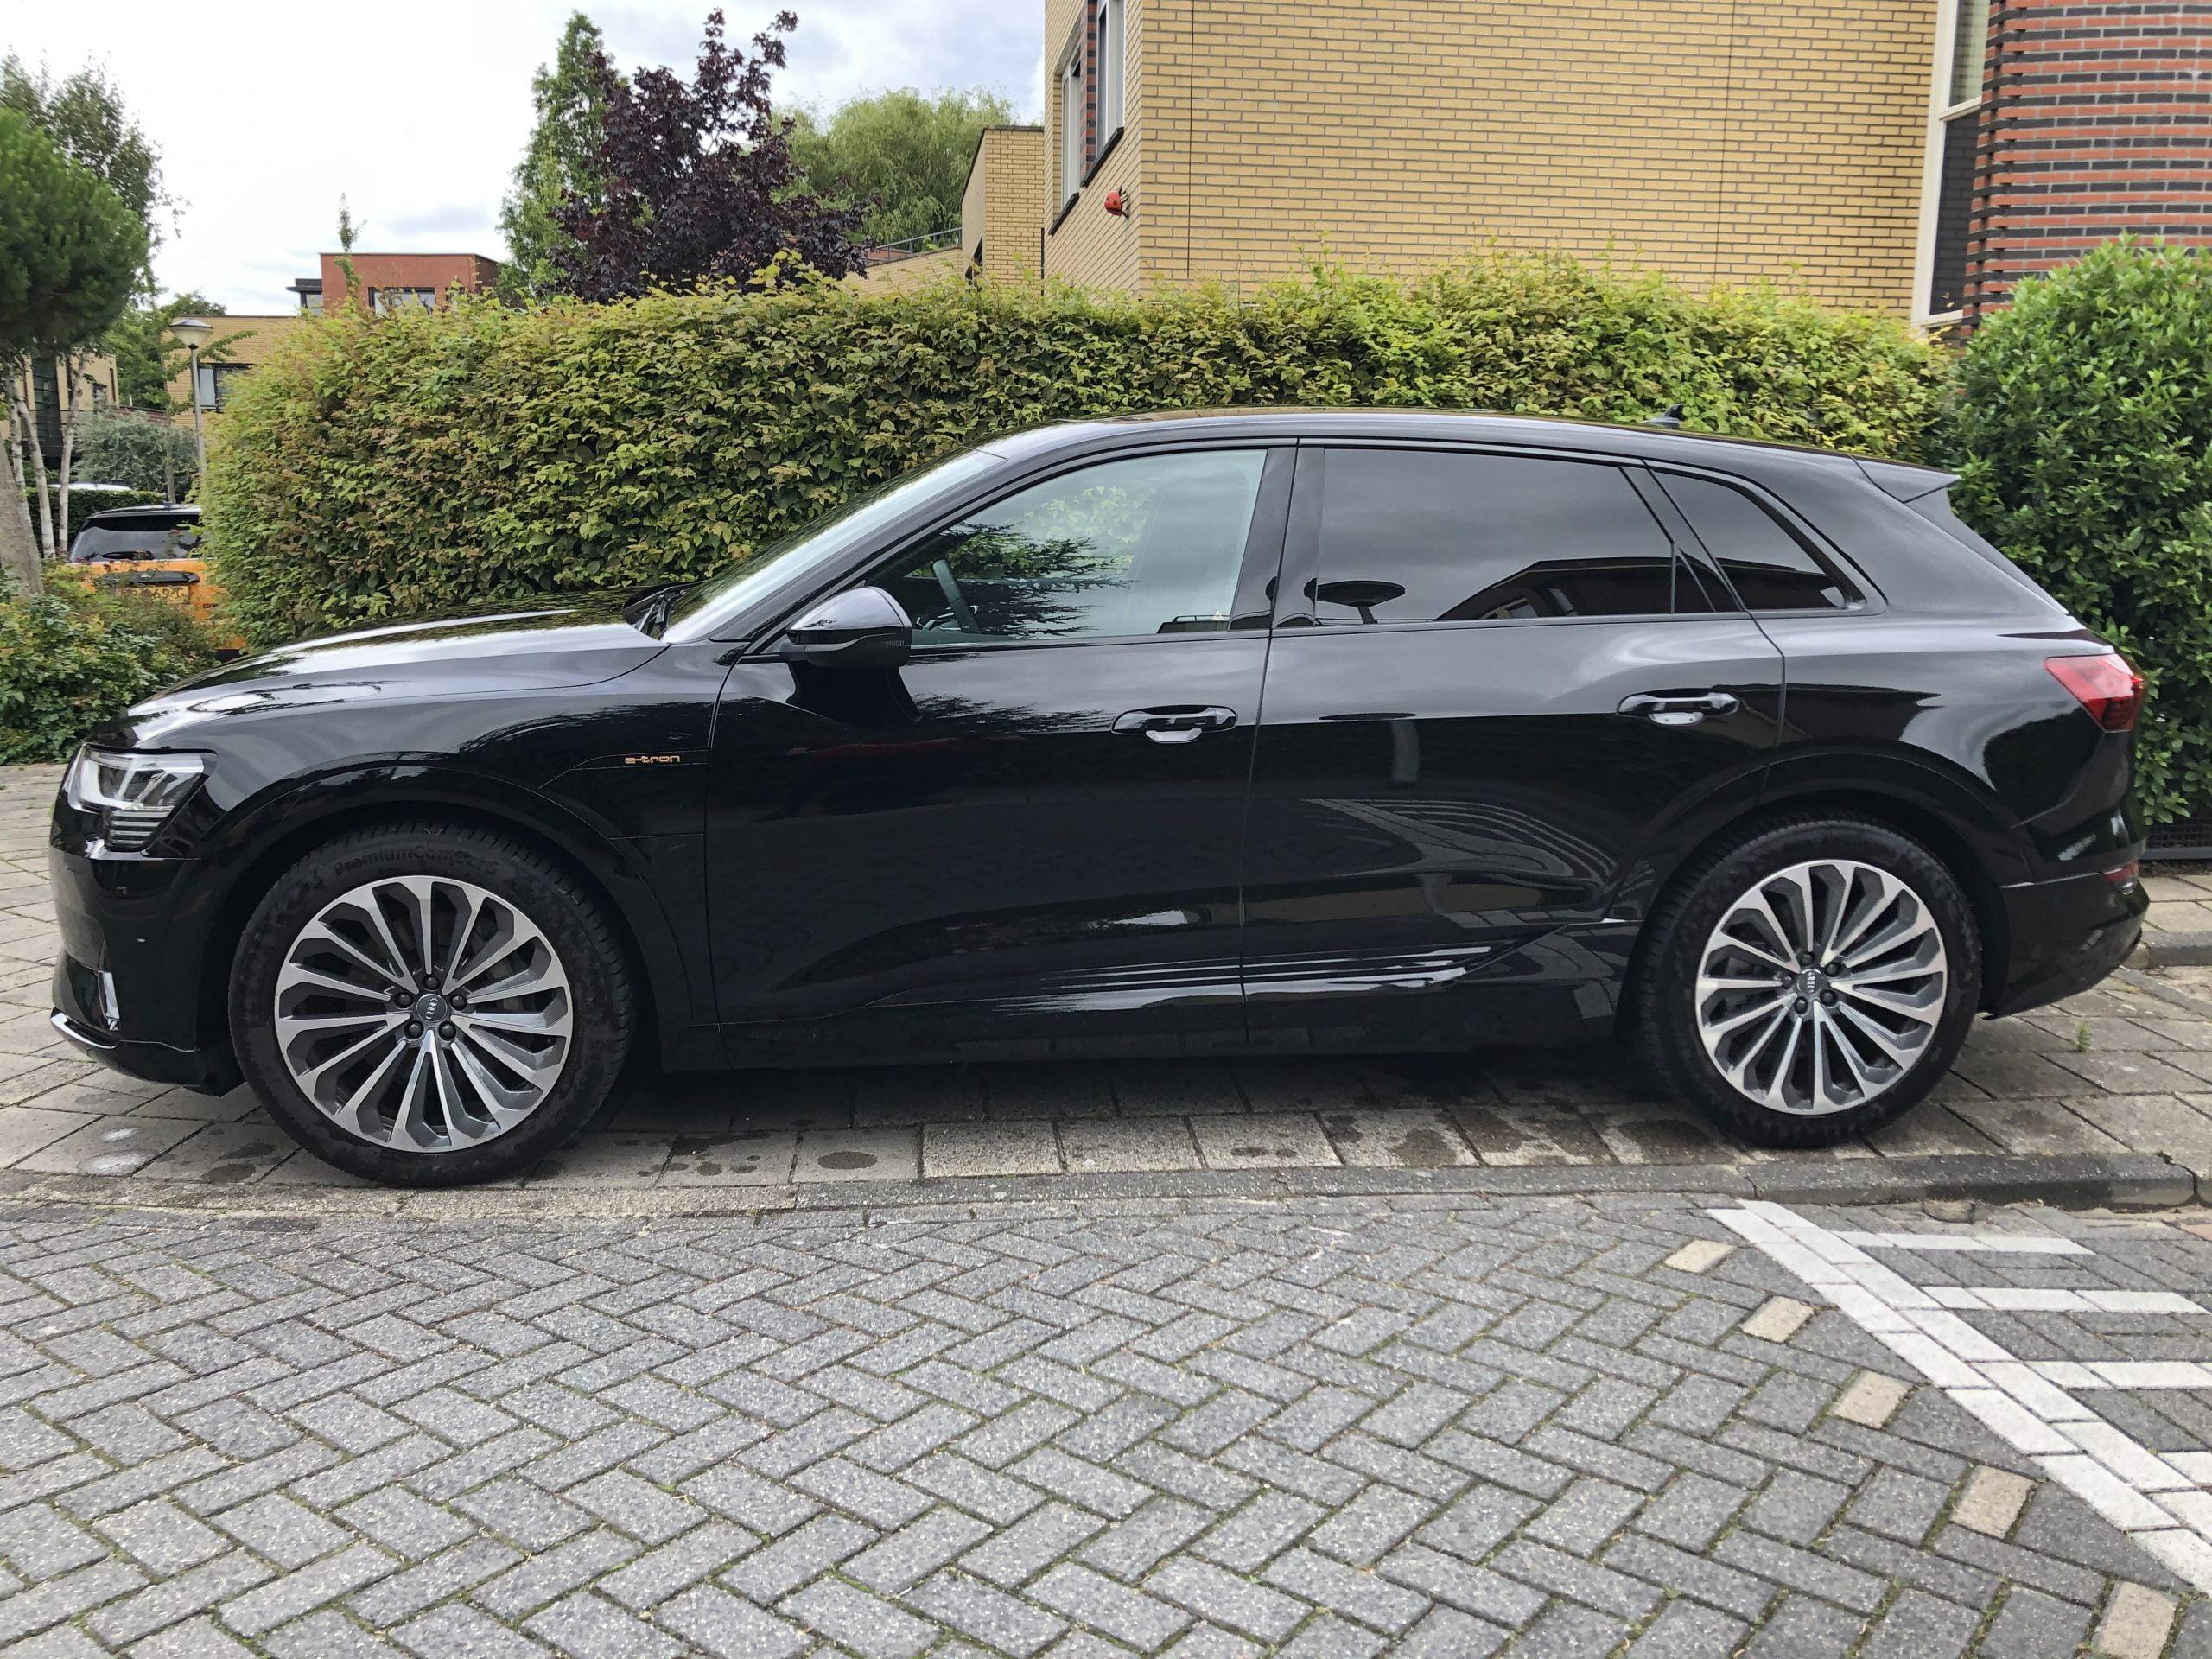 Audi e-tron 55 quattro Advanced Automaat 5d. (4% bijtelling+22% bijtelling!)